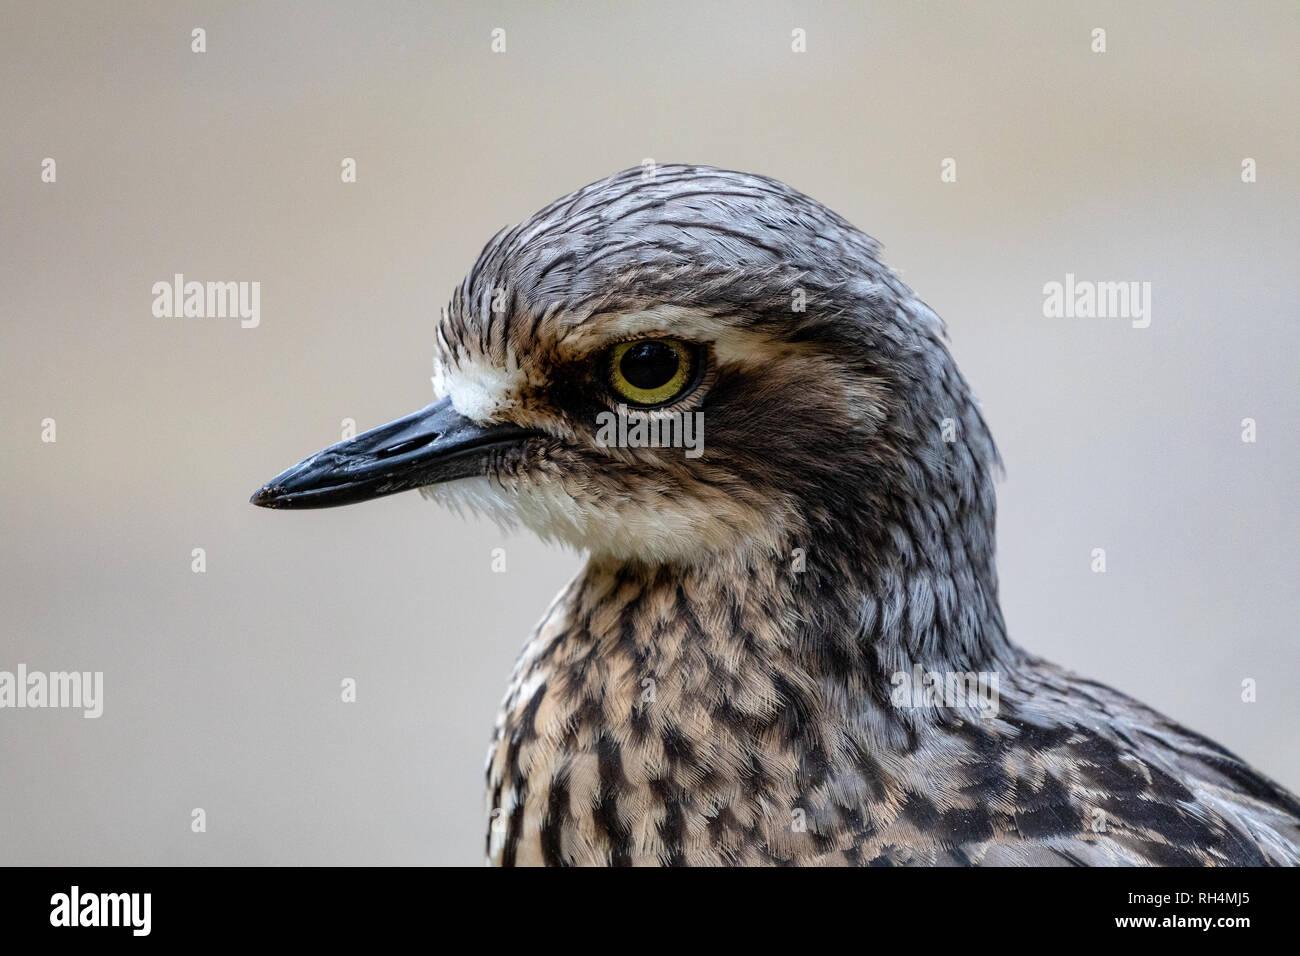 Bush Stone Curlew, Australian Water Bird, landscape orientation - Stock Image